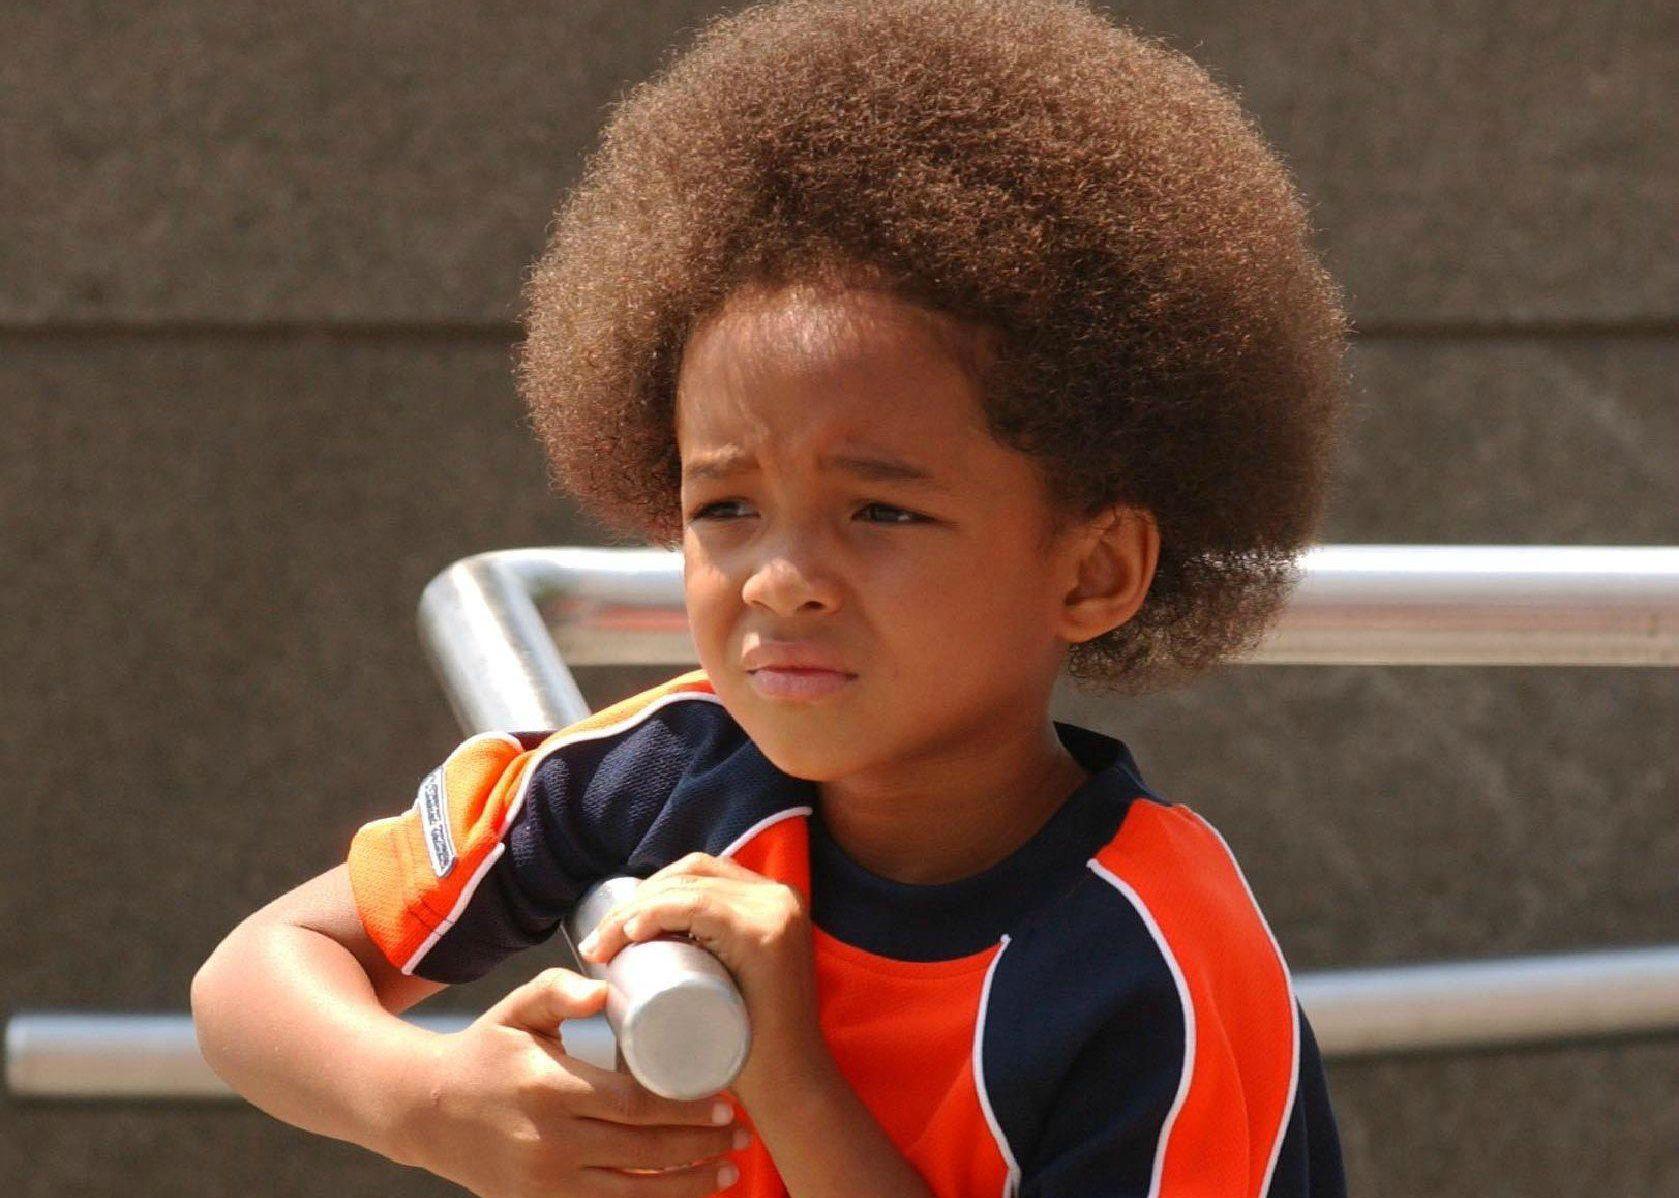 Jaden Smith childhood photo at Sheknows.com